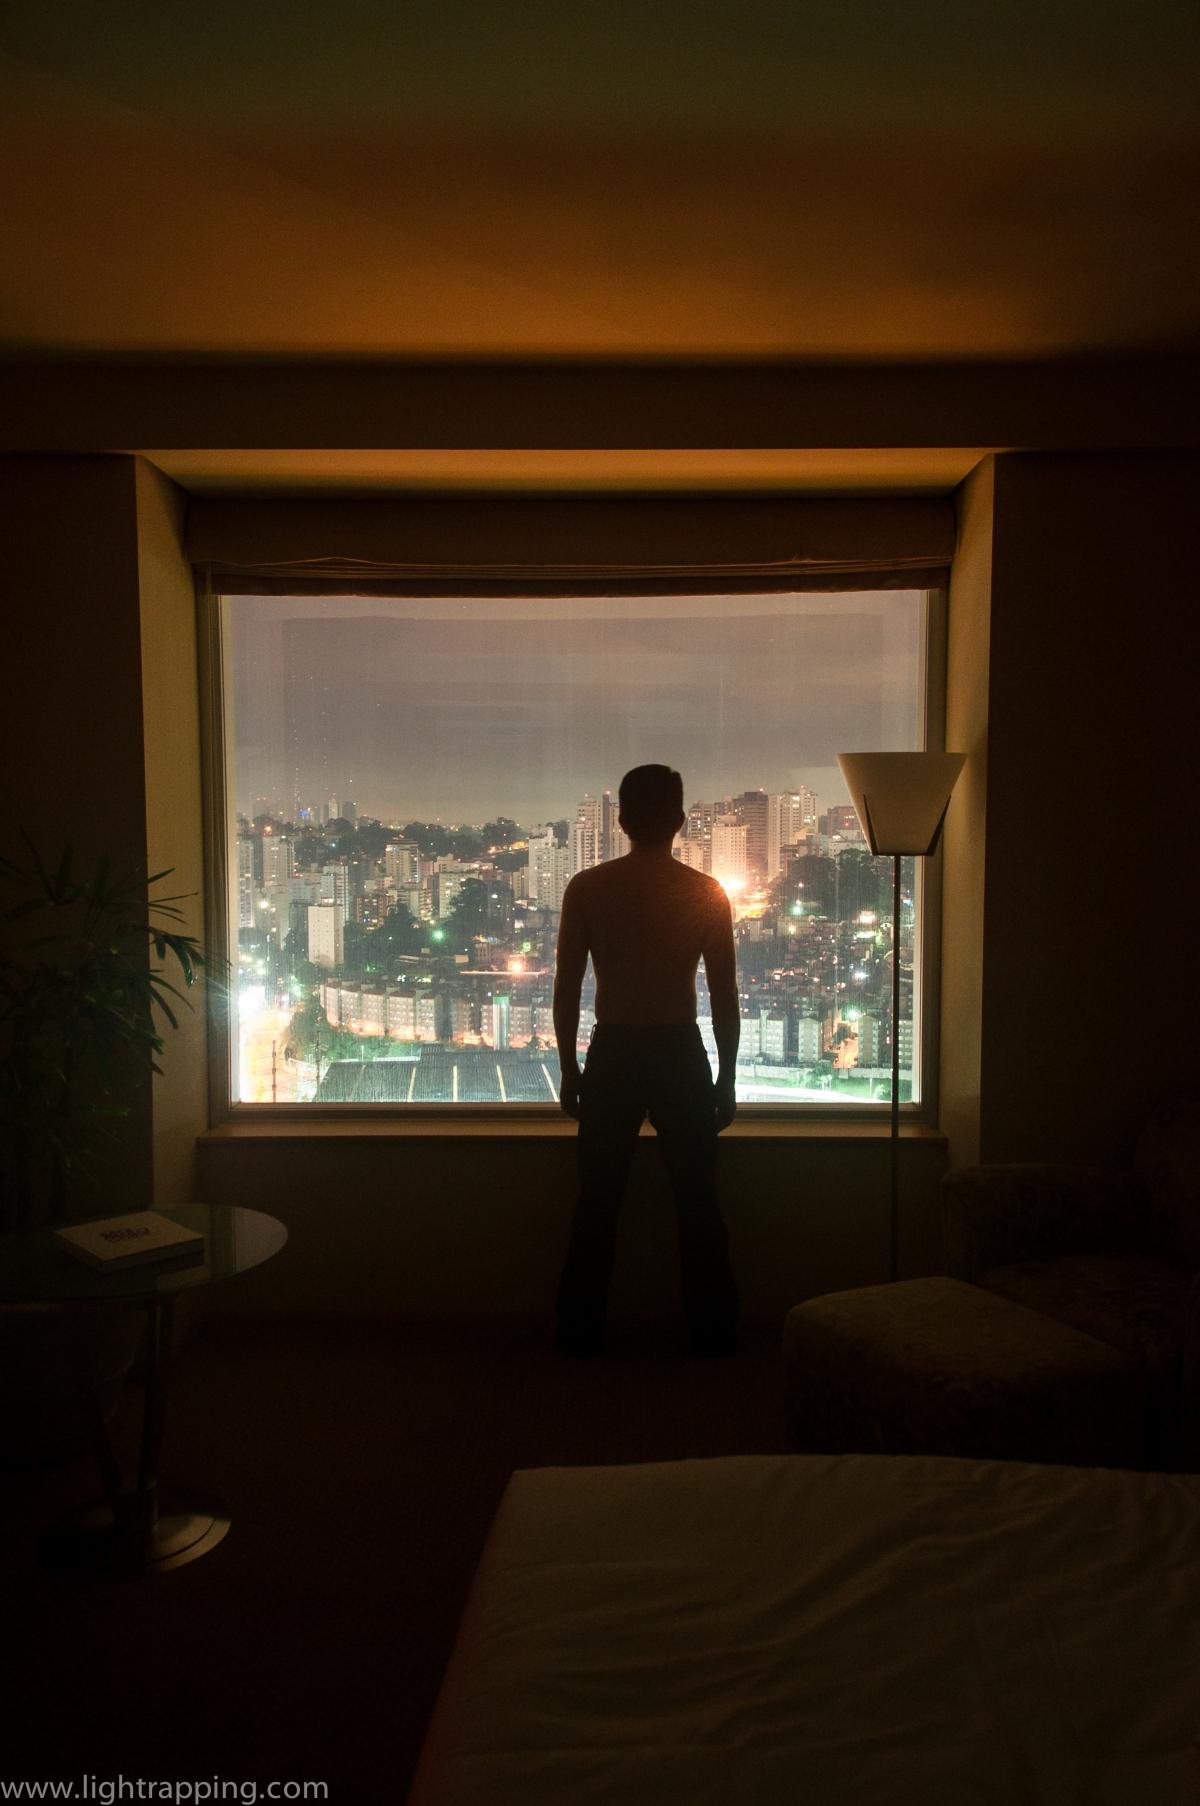 2013, Brazil, Sao Paulo, Hotel, High-Rise, Armchair, Bridge, River